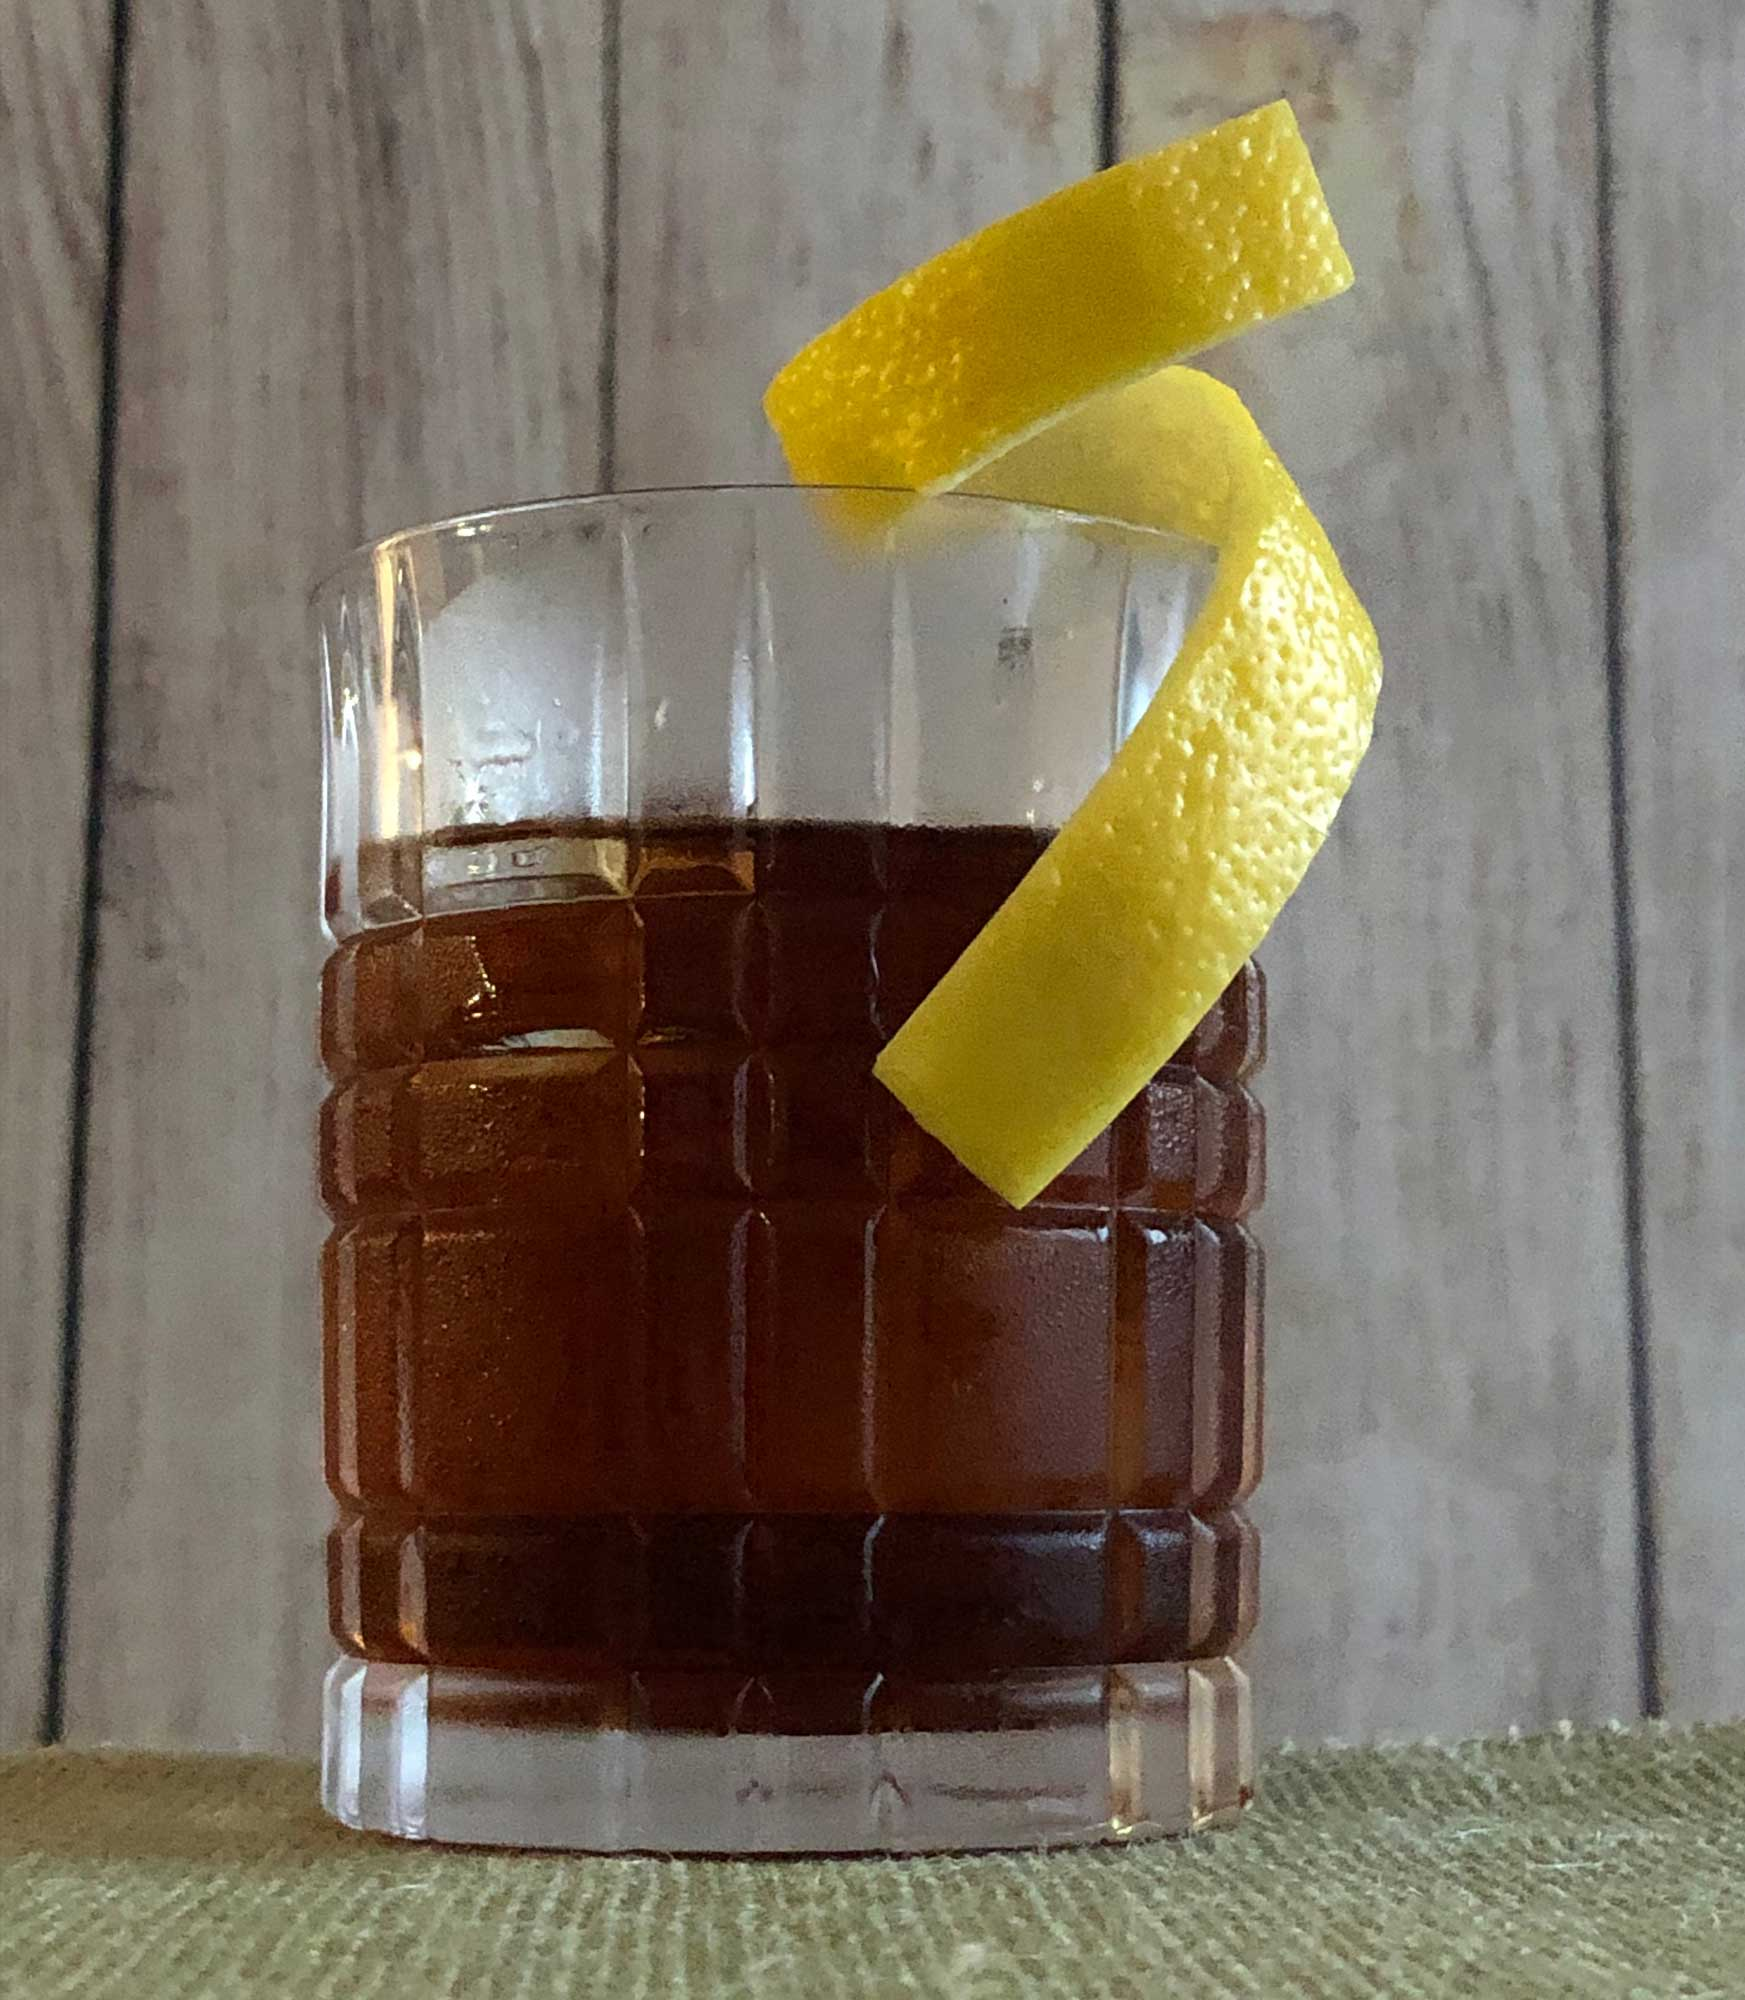 An example of the Juneau, the mixed drink (cocktail), by Lee Edwards, featuring Purkhart Pear Williams Eau-de-Vie, Dolin Génépy le Chamois Liqueur, Nux Alpina Walnut Liqueur, Angostura bitters, and crème de cacao (white); photo by Lee Edwards